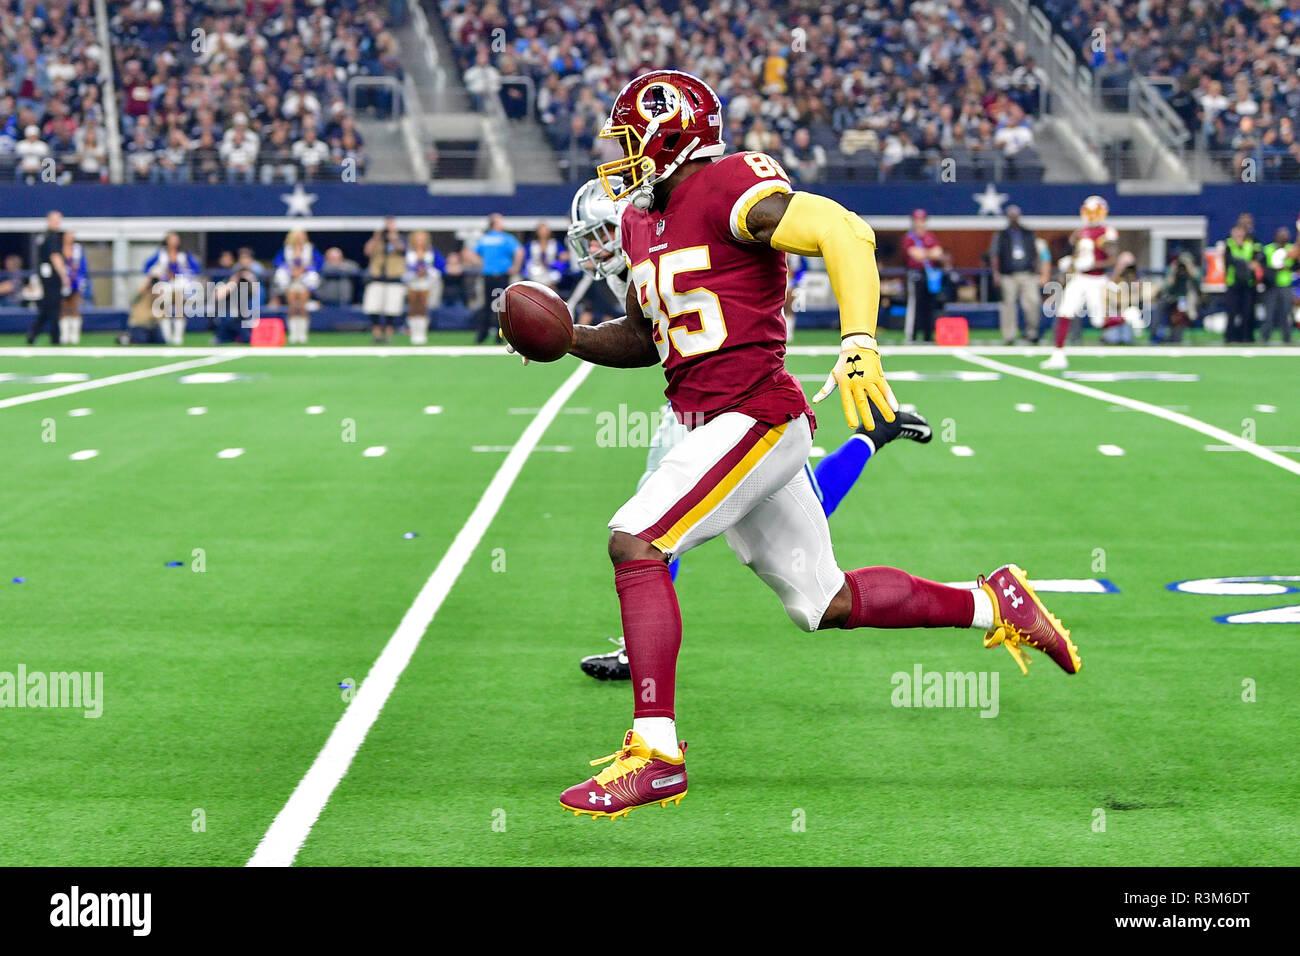 f170d4b304c Noviembre 22, 2018:.Washington Redskins apretado final Vernon Davis (85)  intercepta